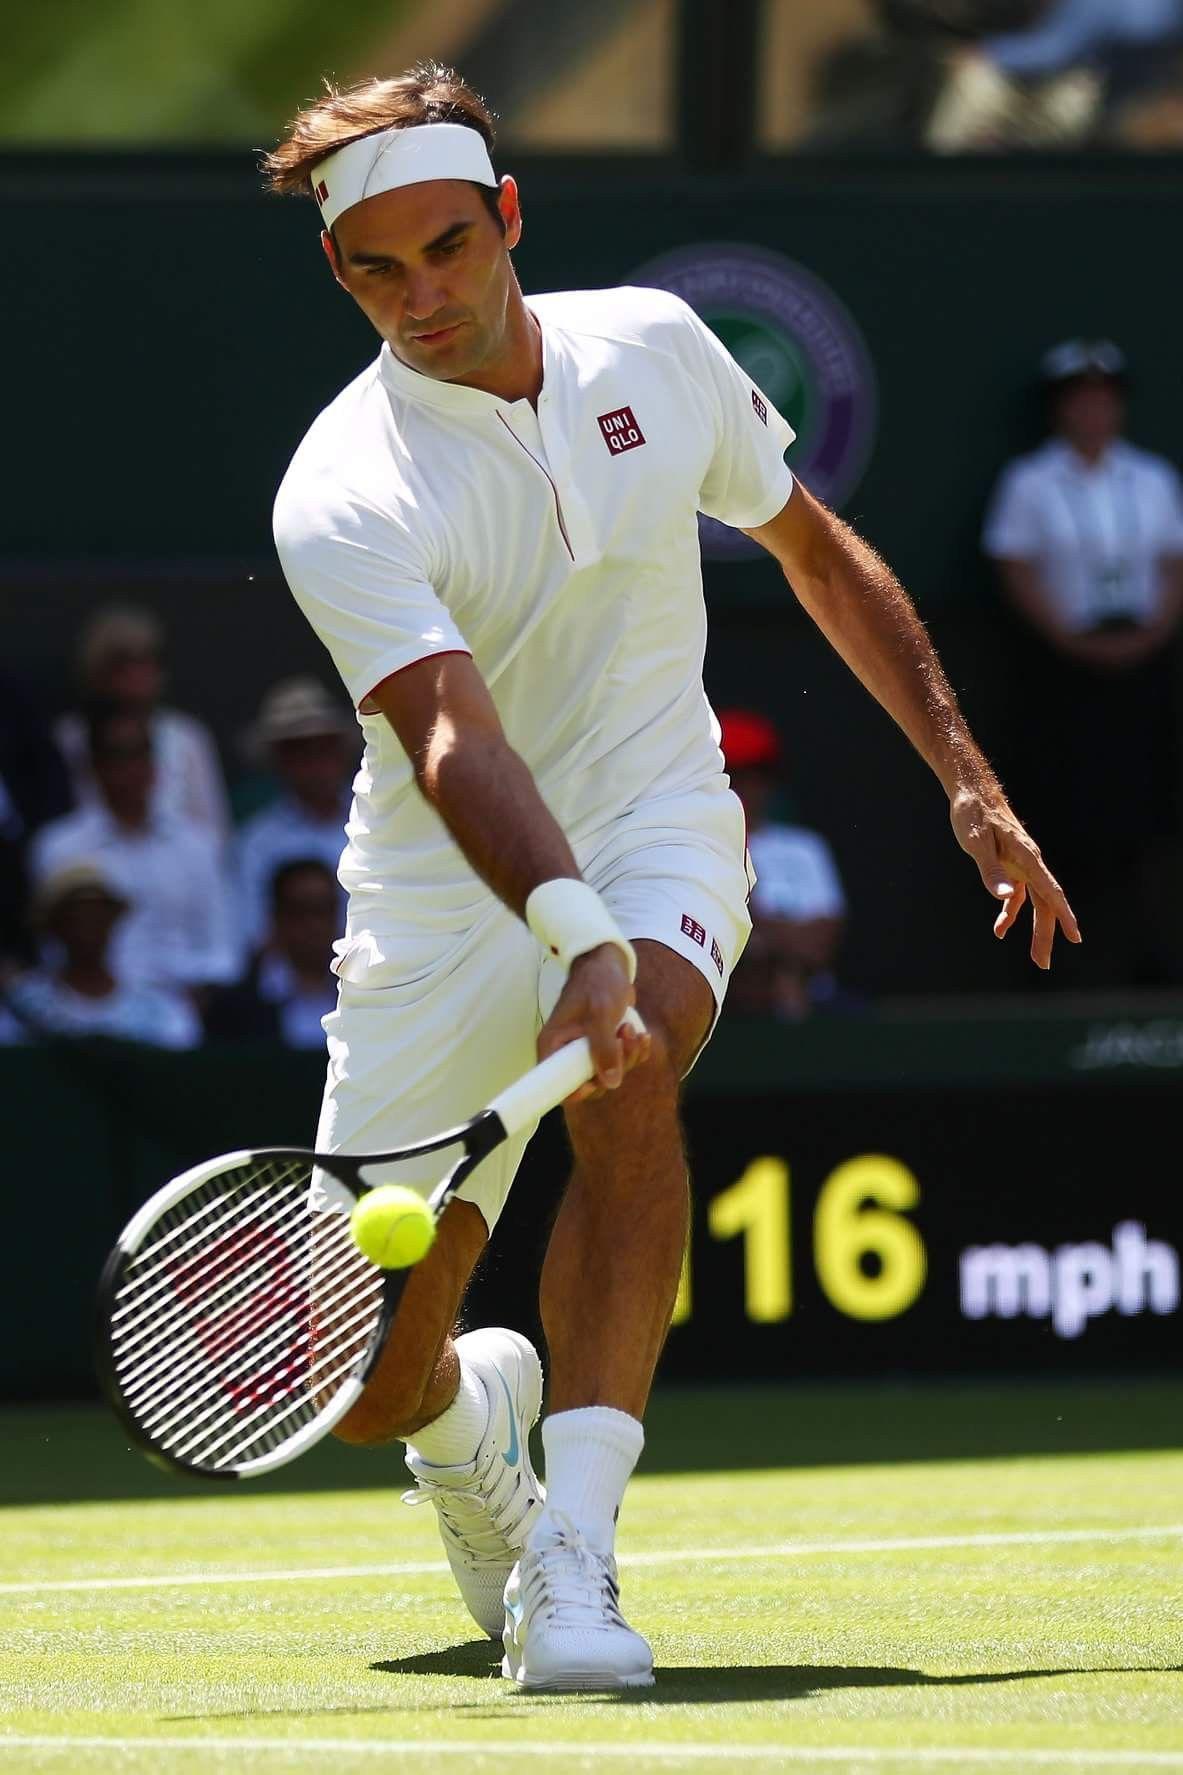 Roger Federer Wimbledon 18 画像あり フェデラー 男子 テニス ロジャーフェデラー